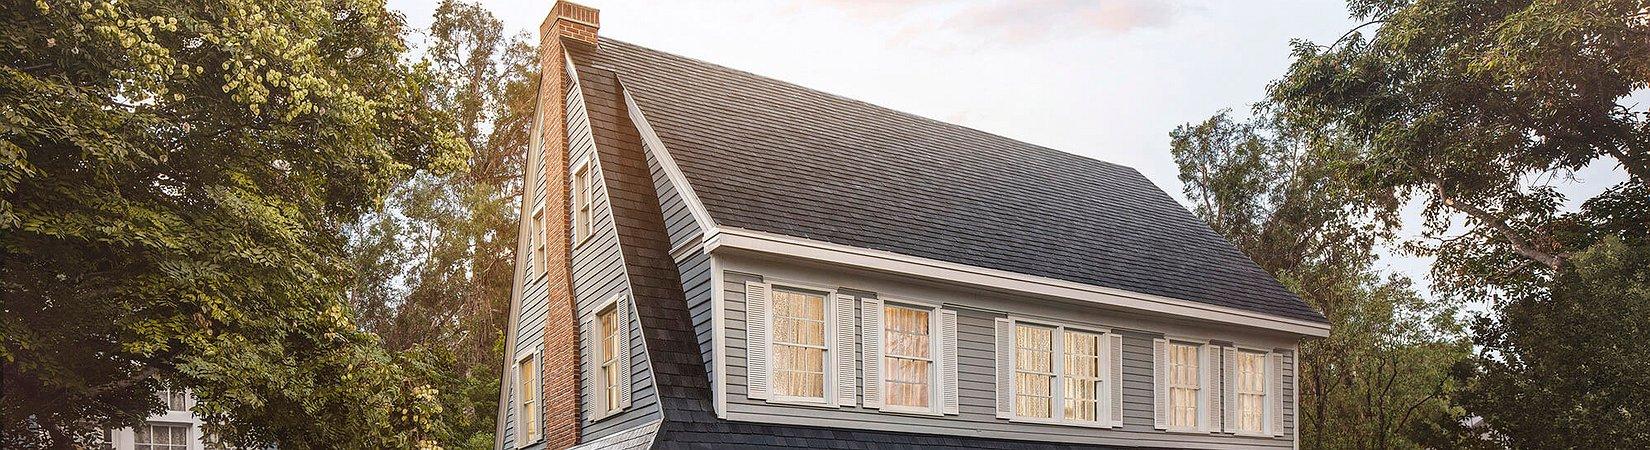 Telsa solar roof tiles ready to pre-order